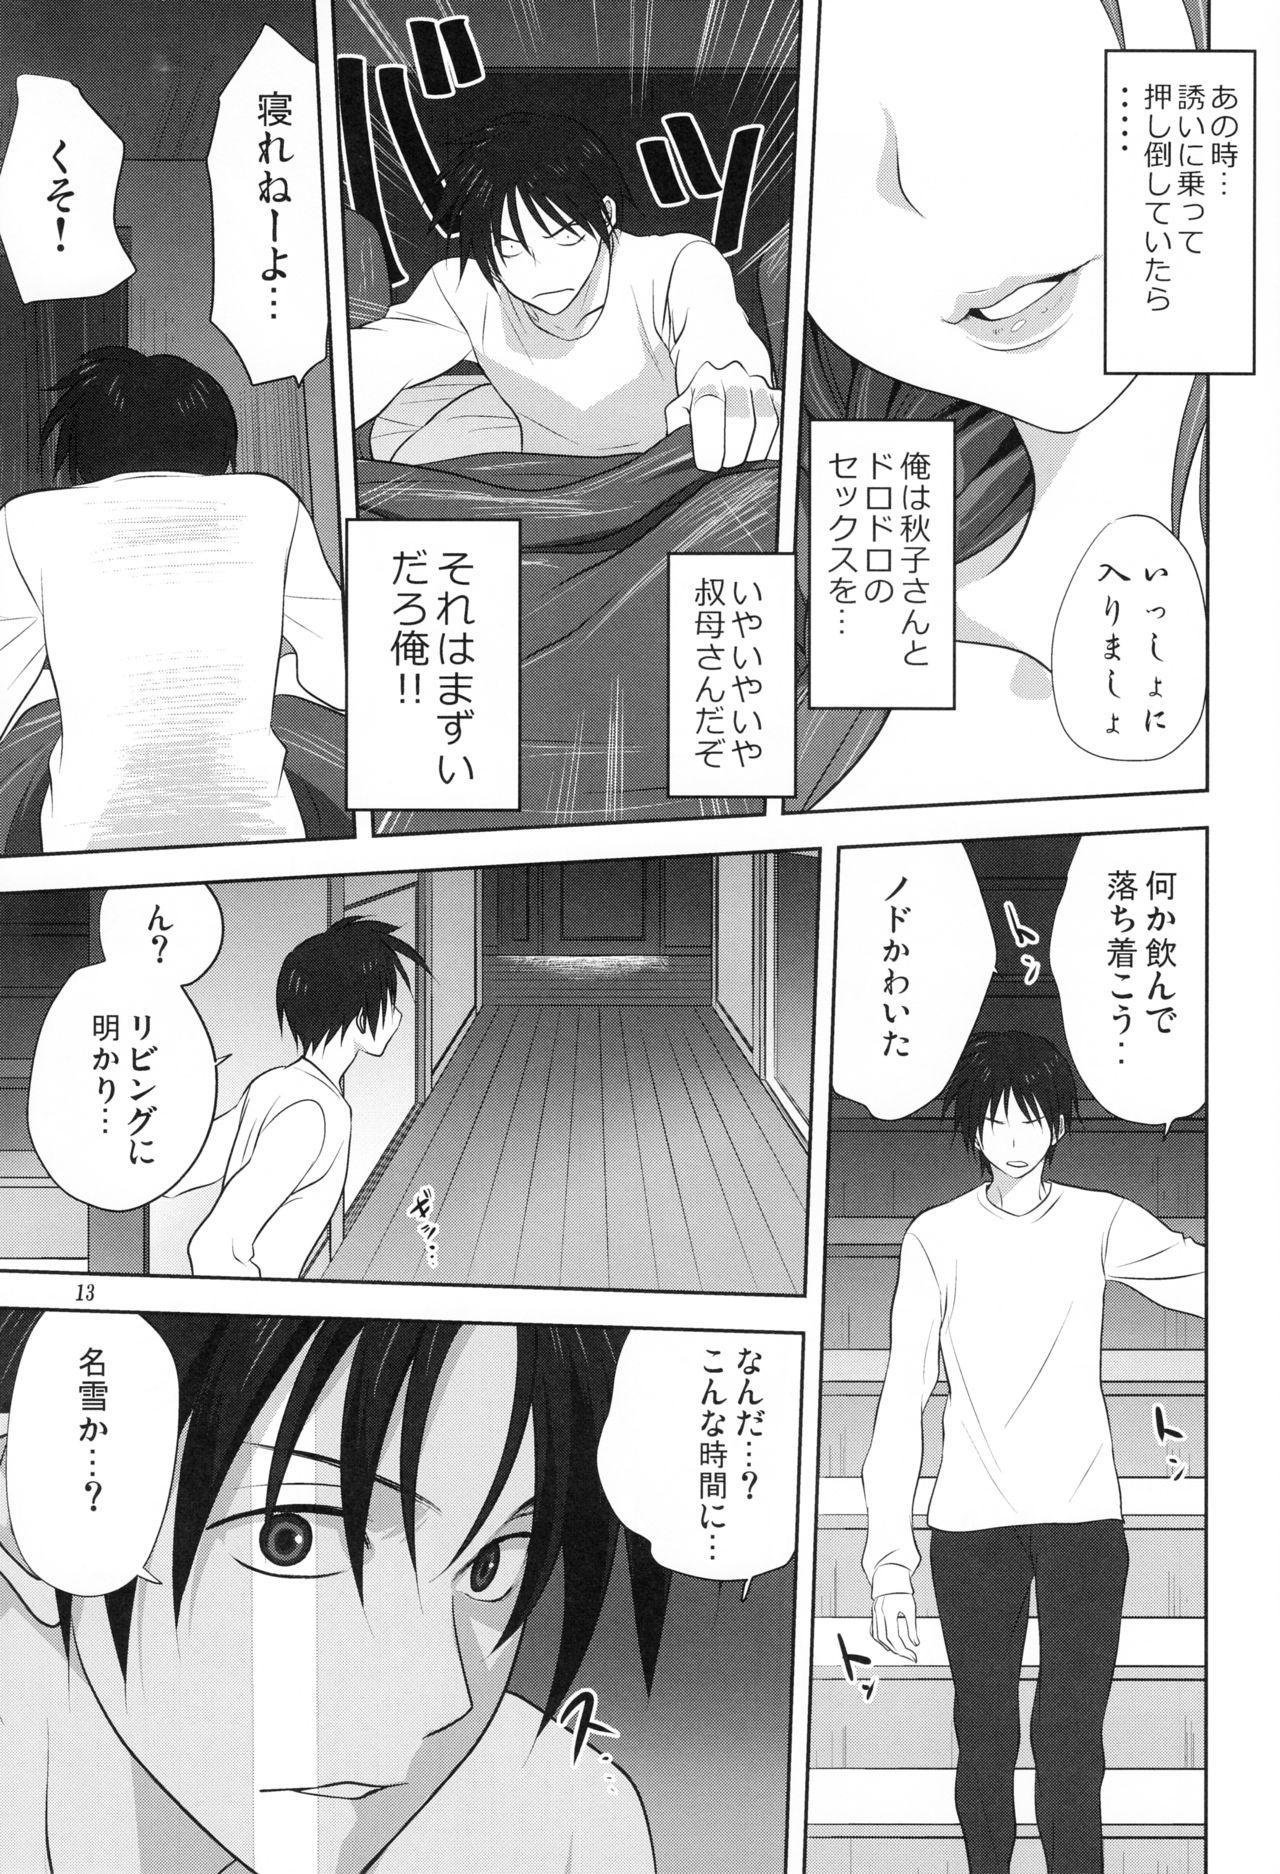 Akiko-san to Issho 18 11